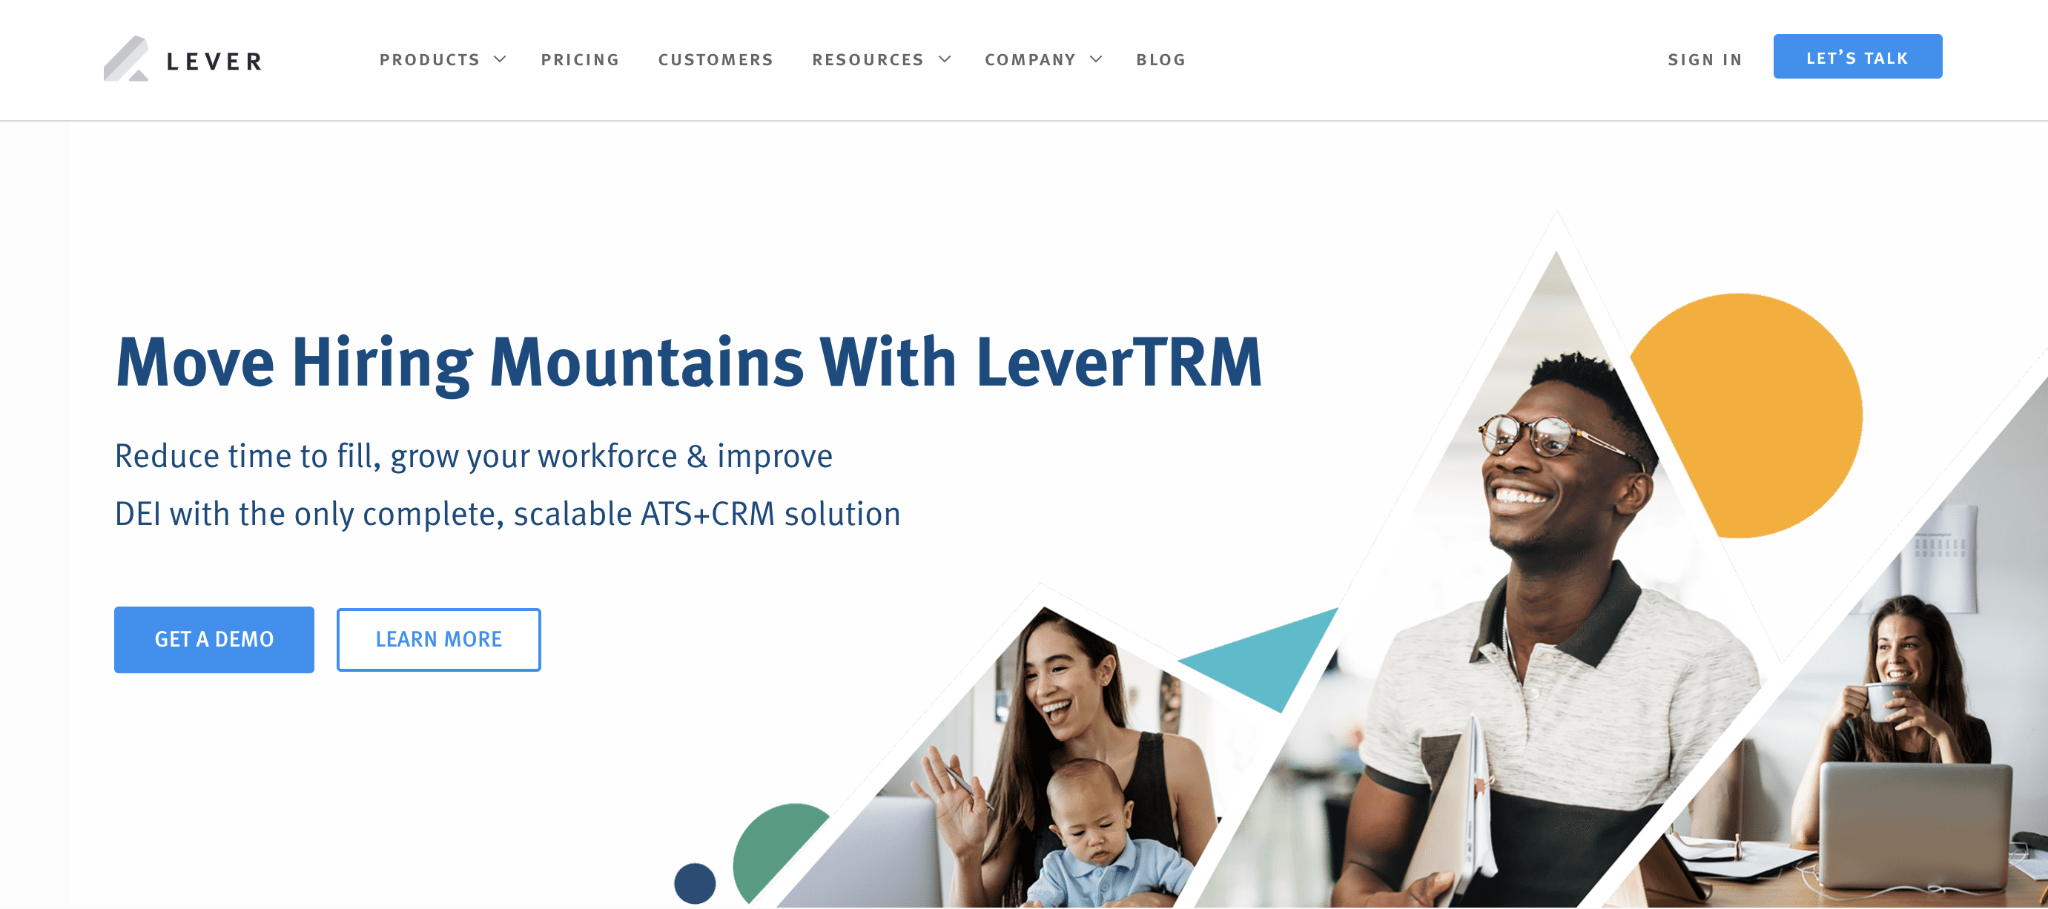 Breezy HR Alternative #2: Lever